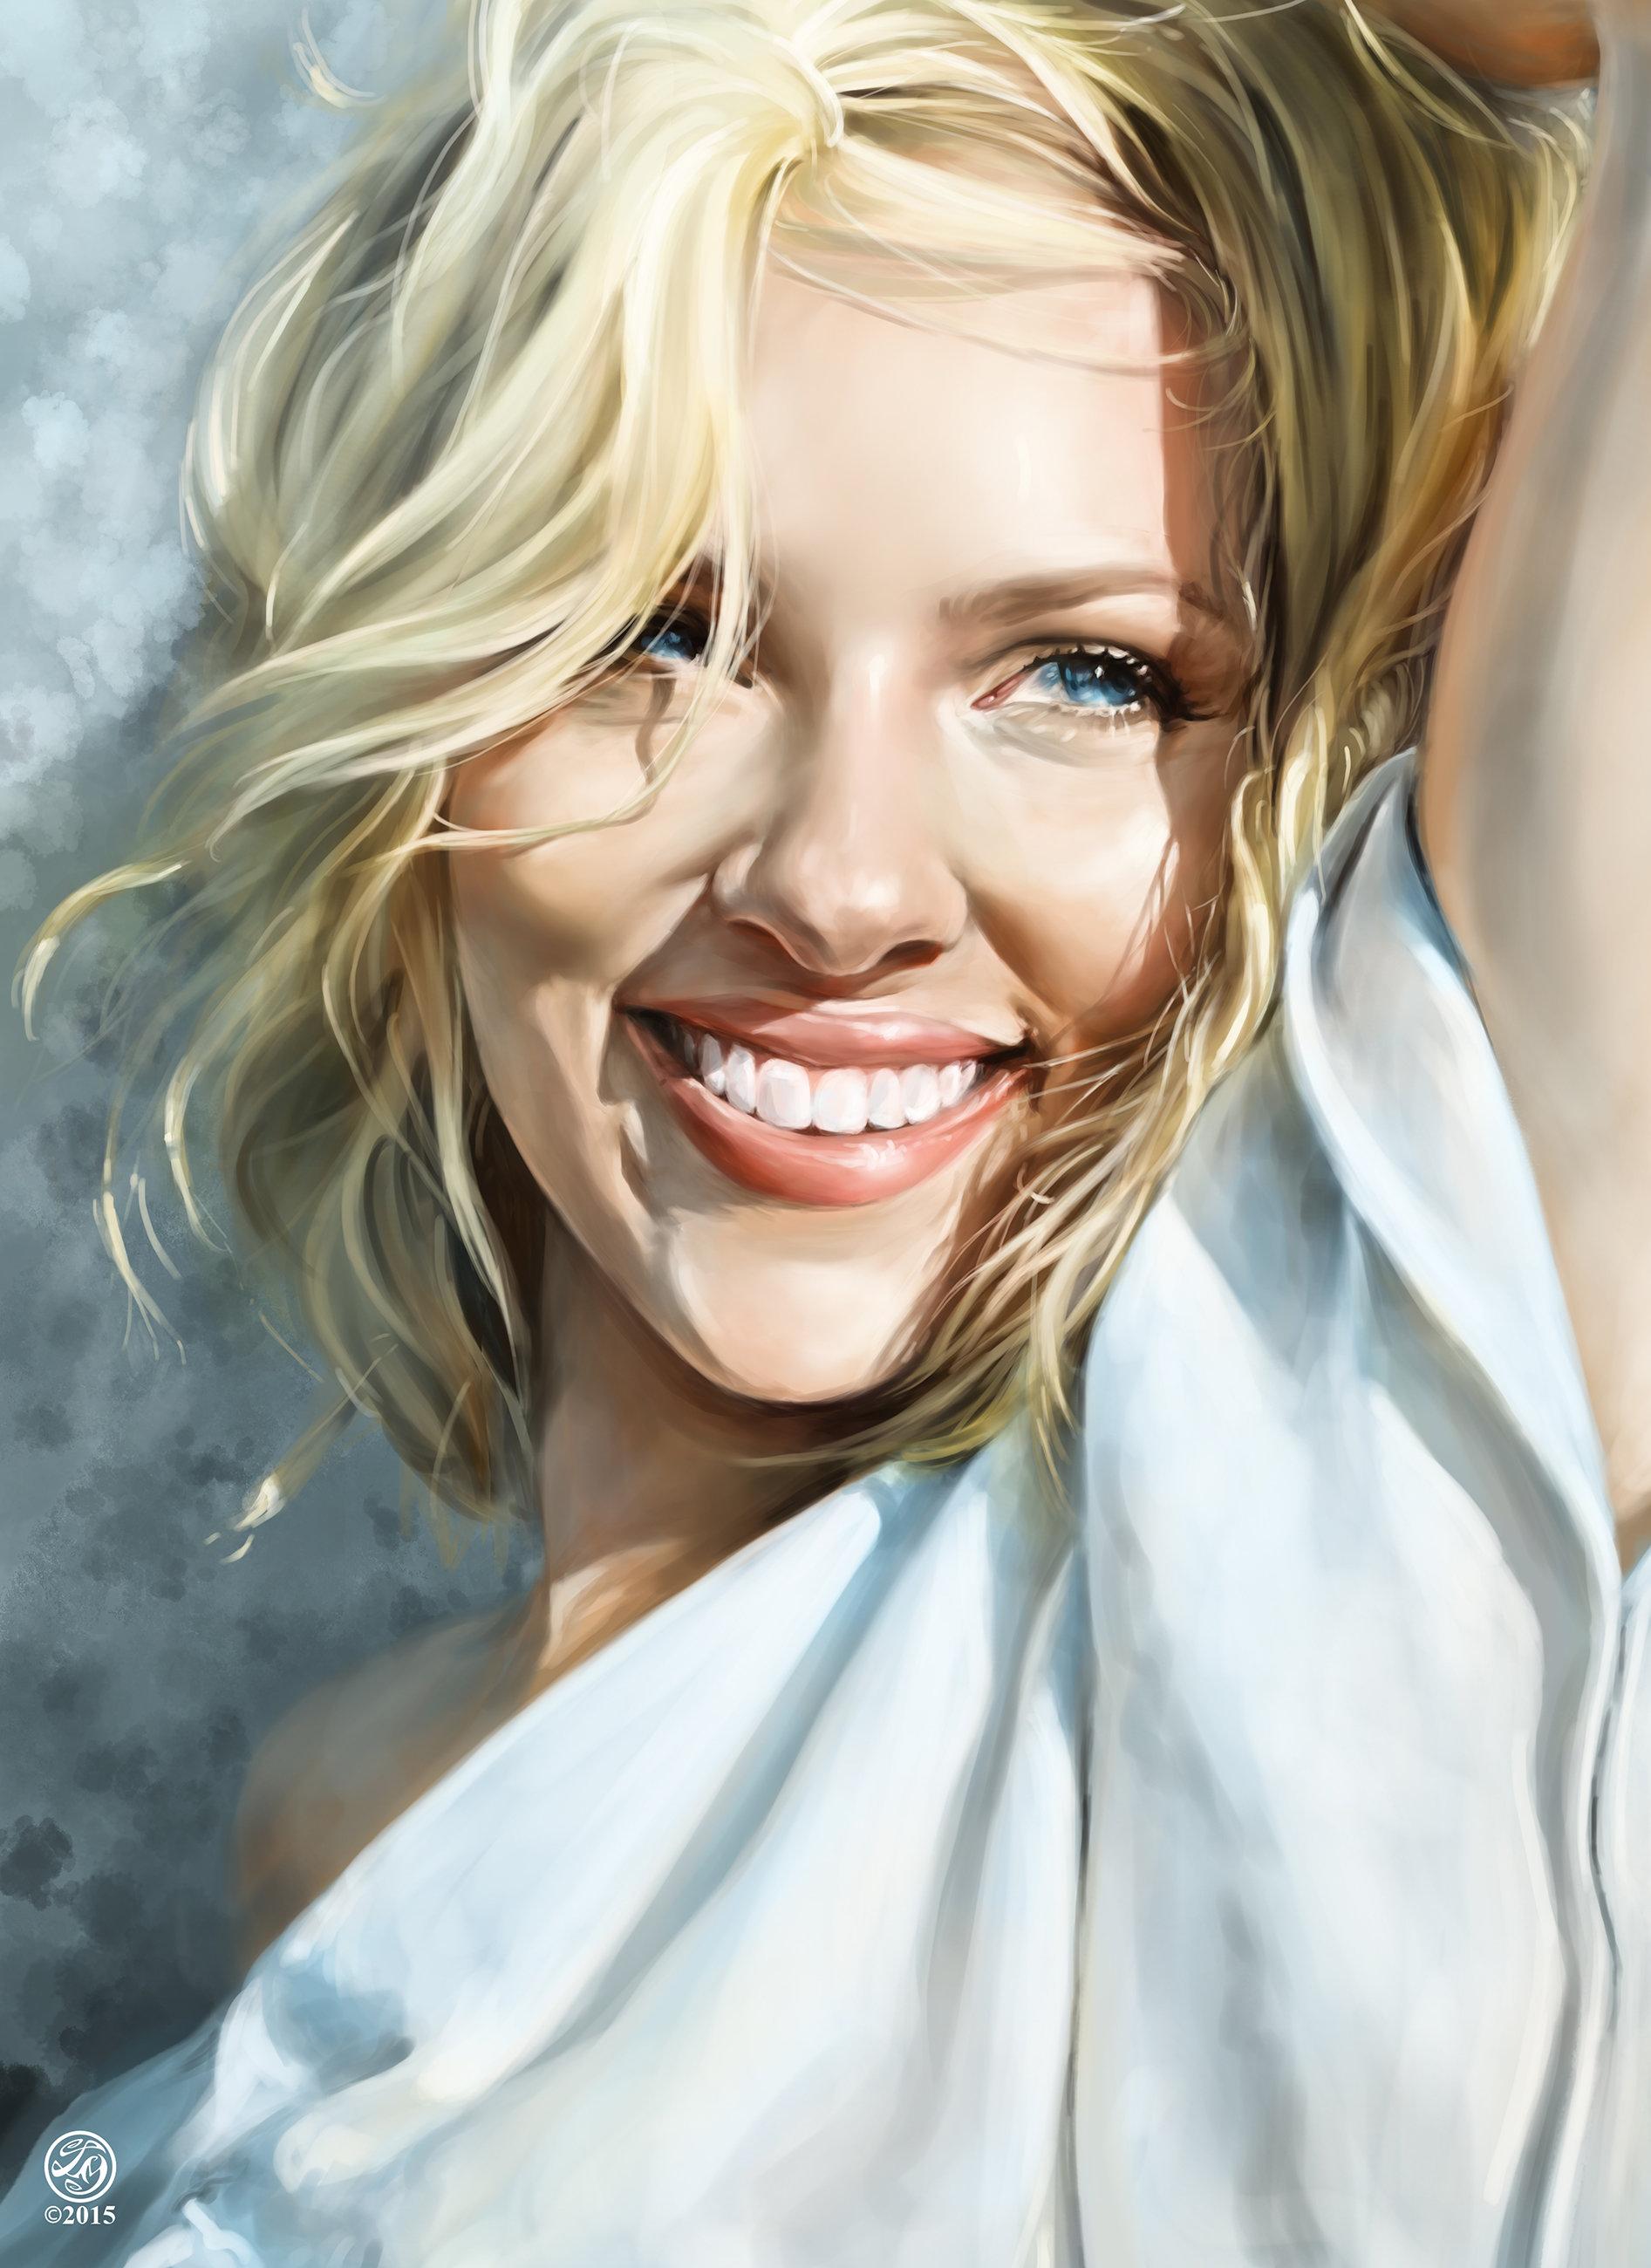 Artstation - Scarlett Johansson Portrait Catherine Steuer